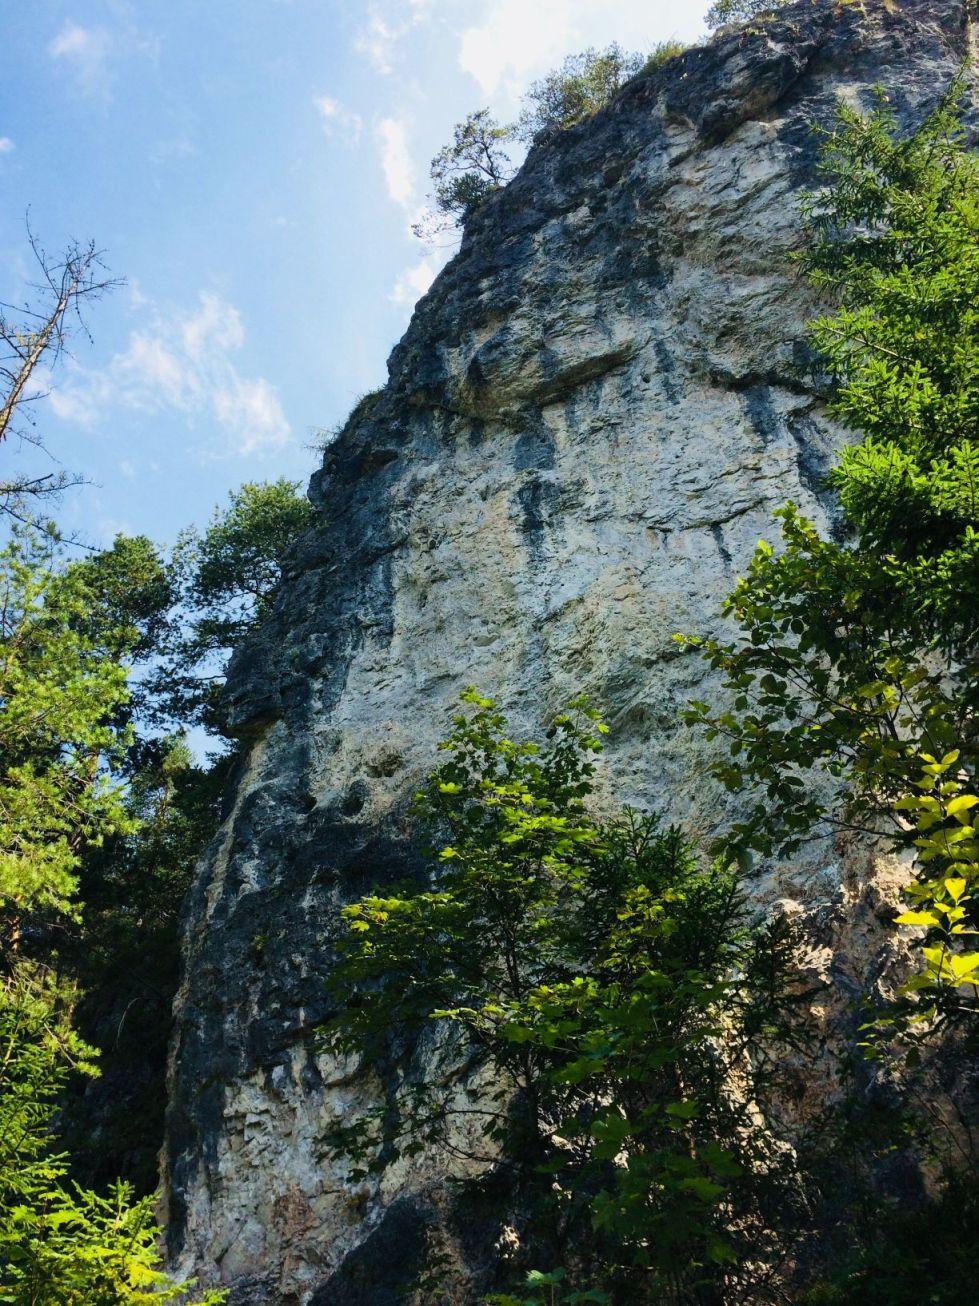 Klettergarten Klobental Frontansicht der dicken Schuppe | Climbers Paradise